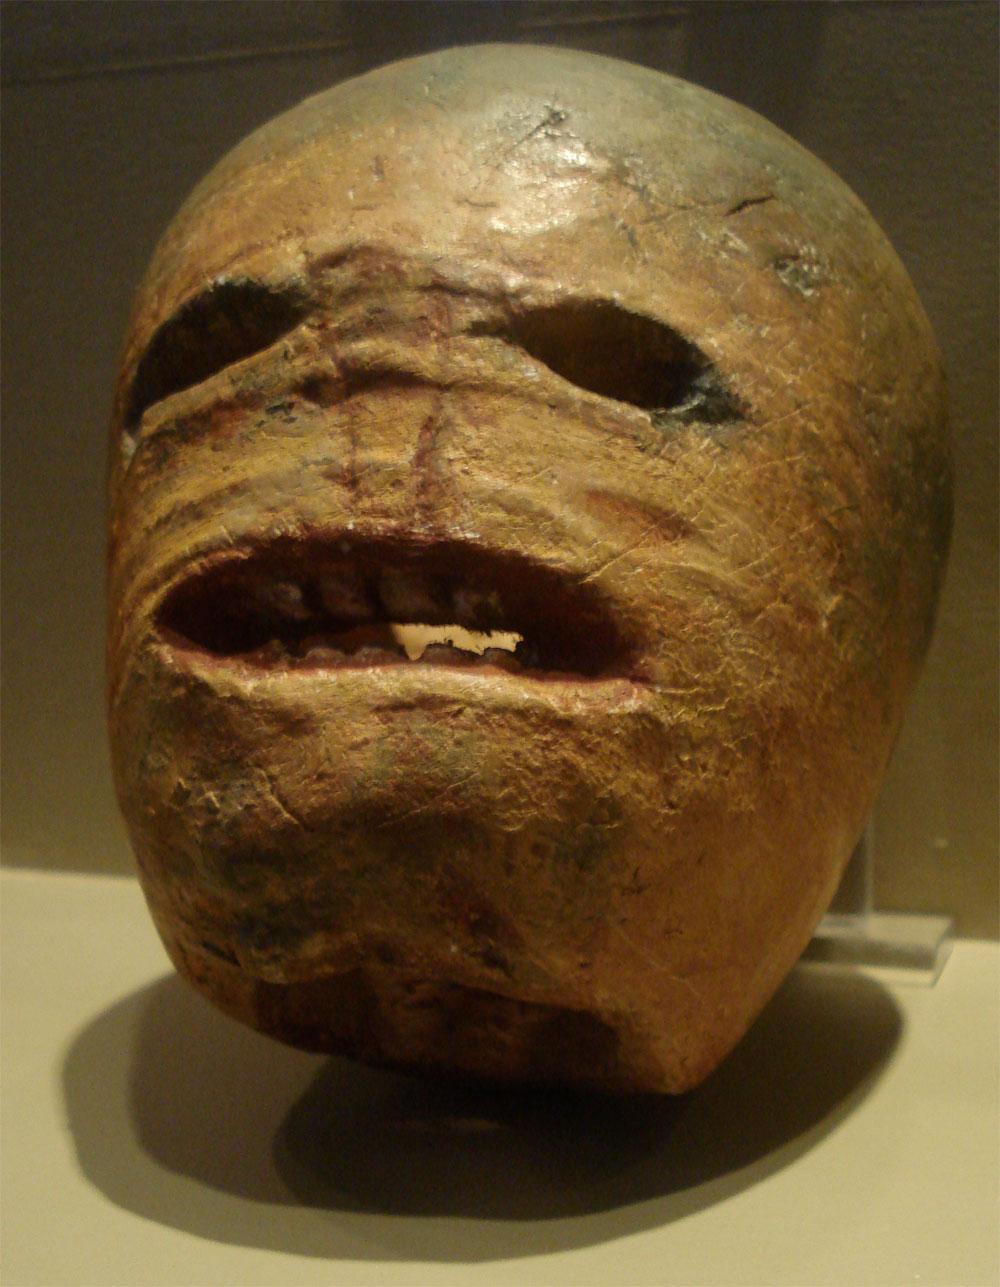 Traditional Irish Turnip Jack-o'-lantern